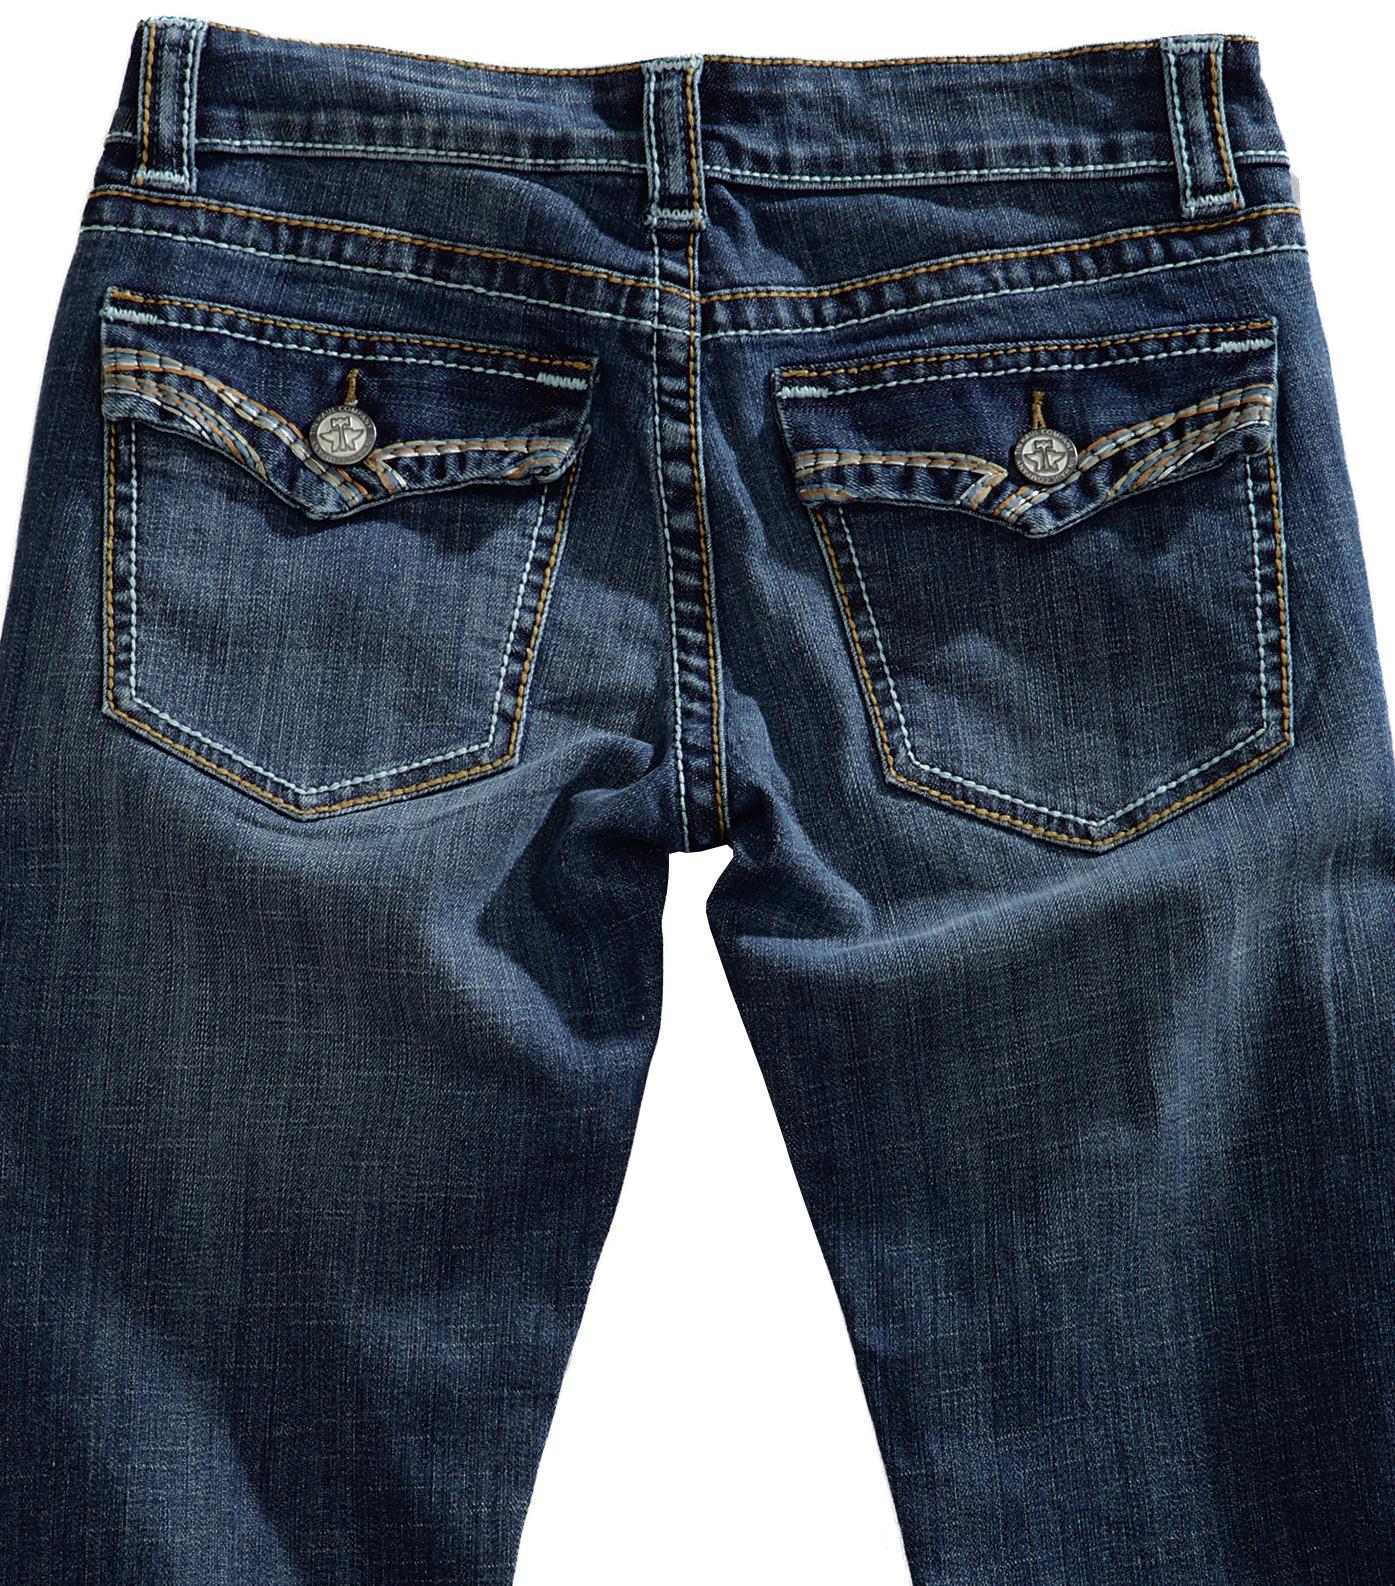 Tin Haul Women's Jeans - Sears